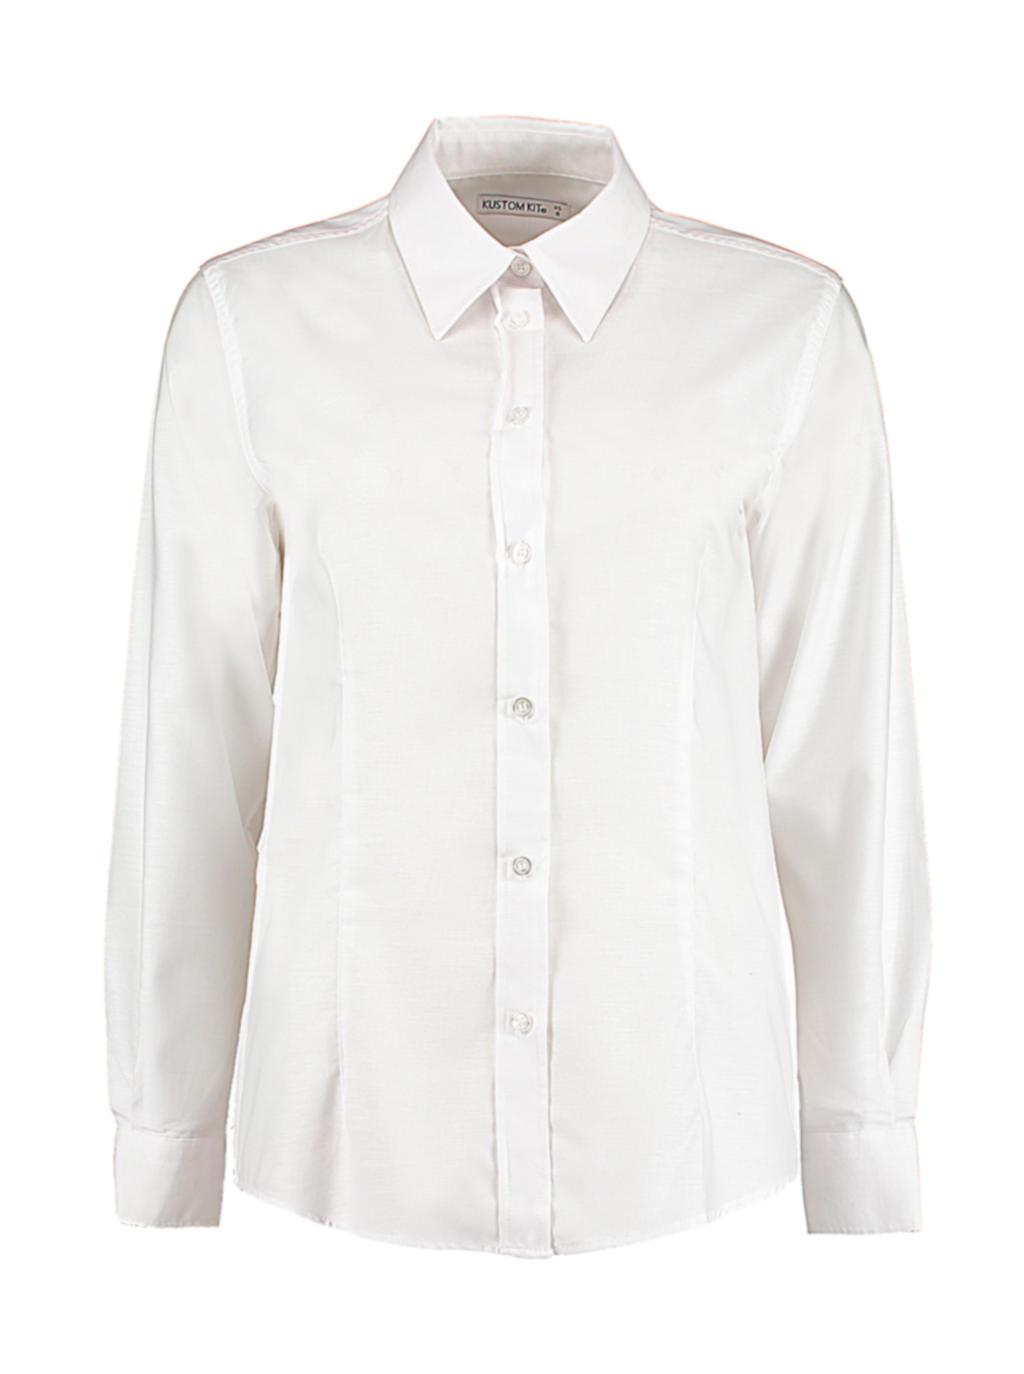 Women`s Promotional Oxford Shirt LS